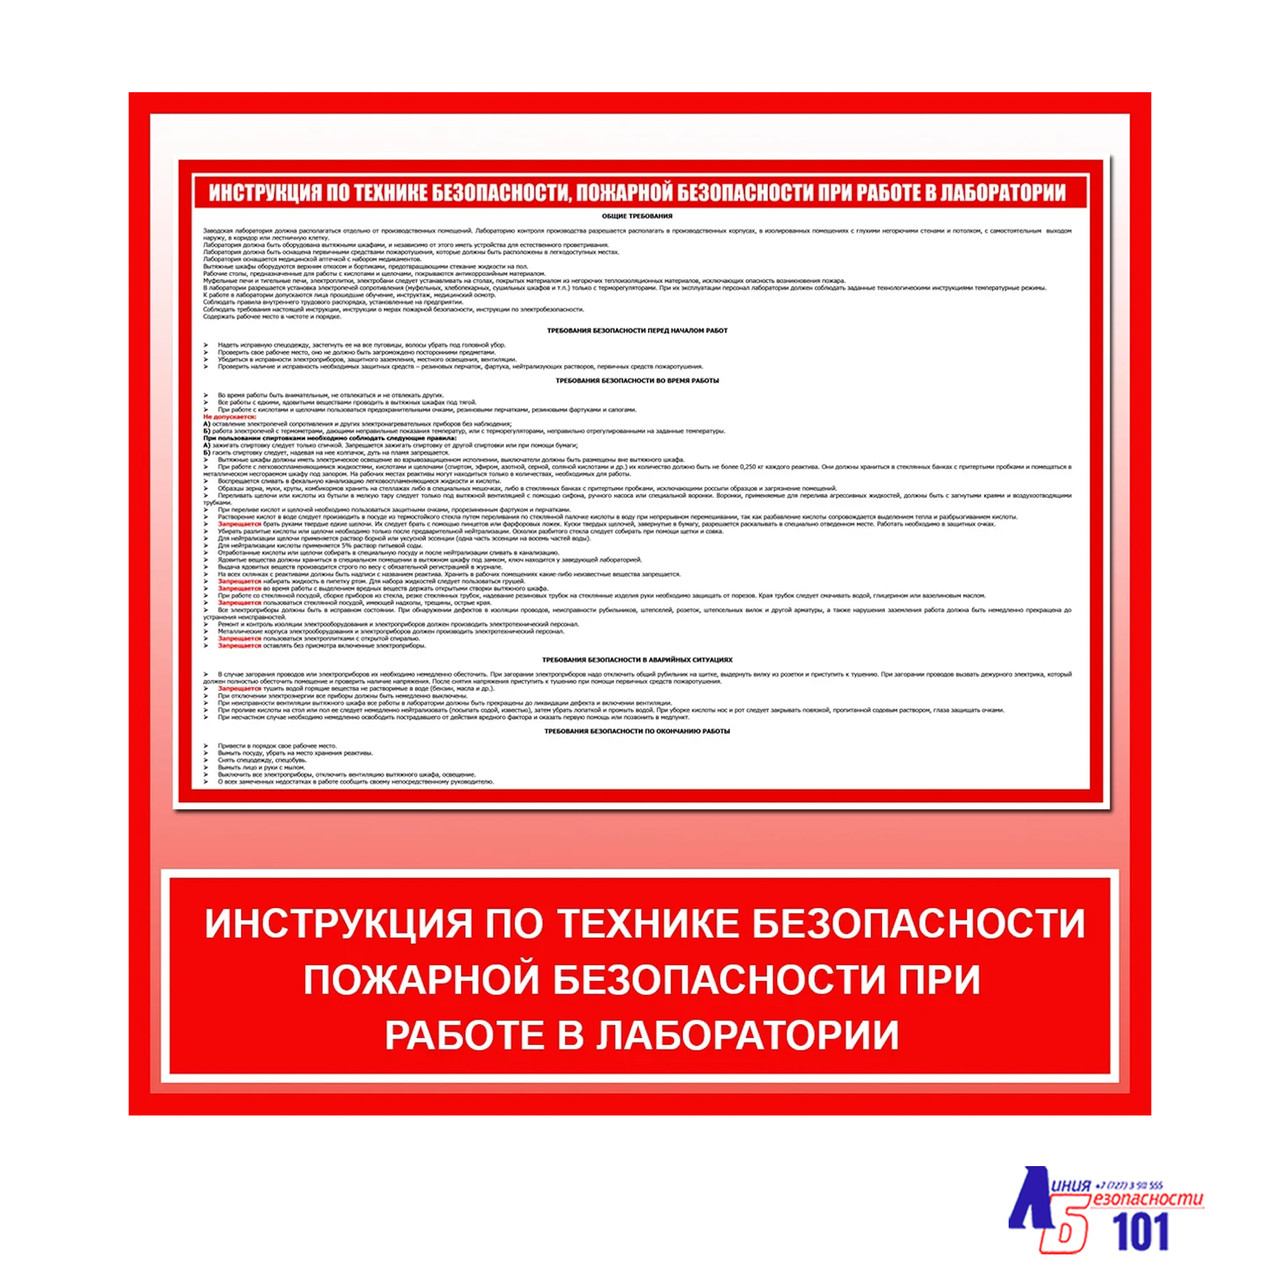 "Плакат ""Инструкция по технике безопасности пожарной безопасности при работе в лаборатории"""